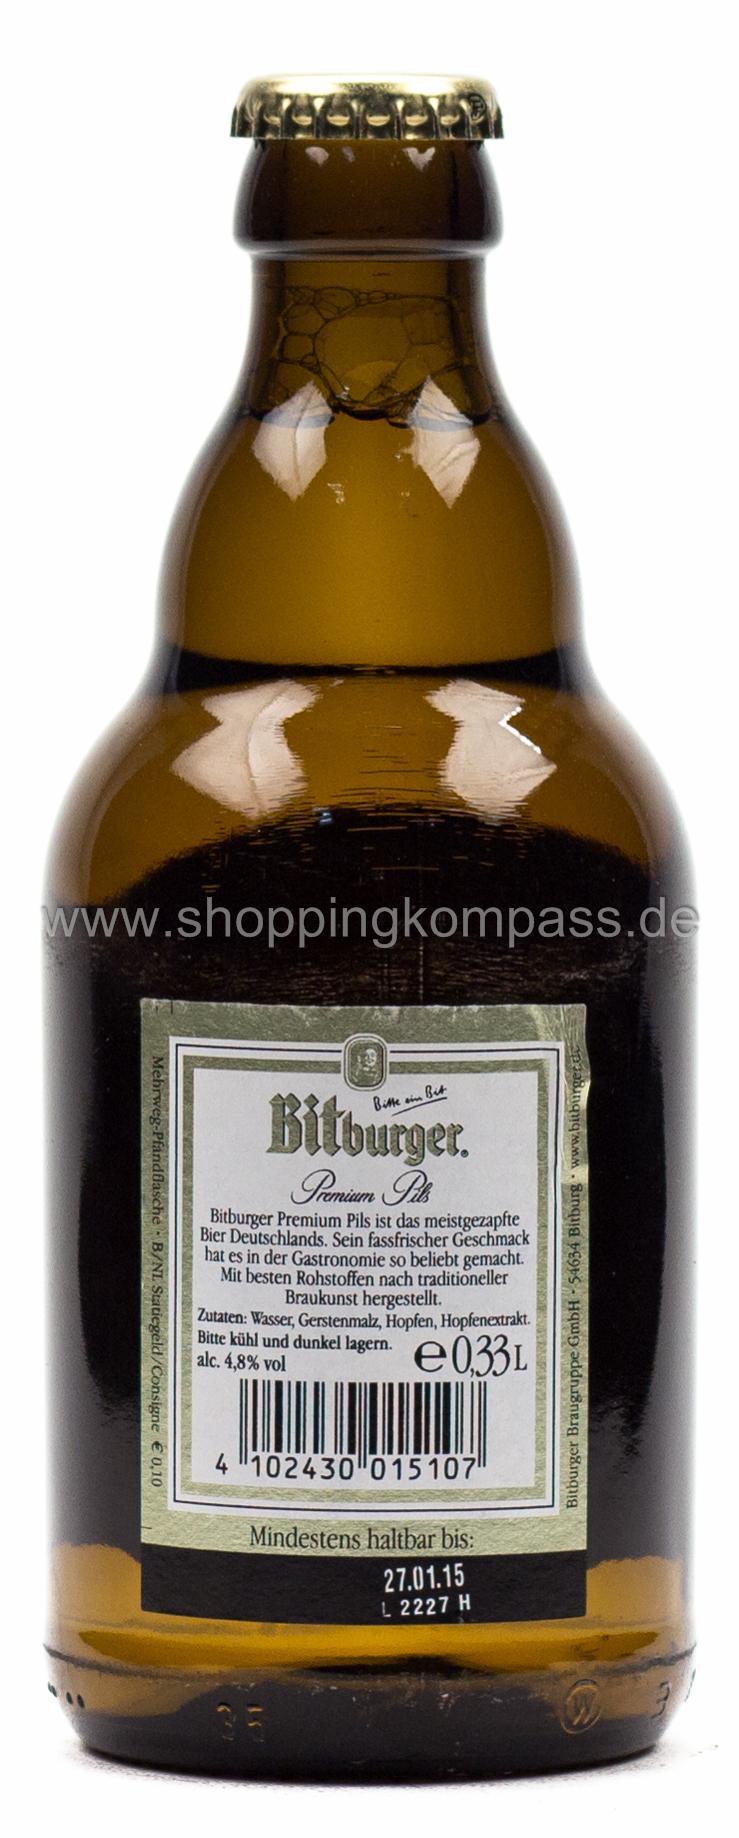 Pils Export Bitburger Pils Steini 033 L Glas Mehrweg